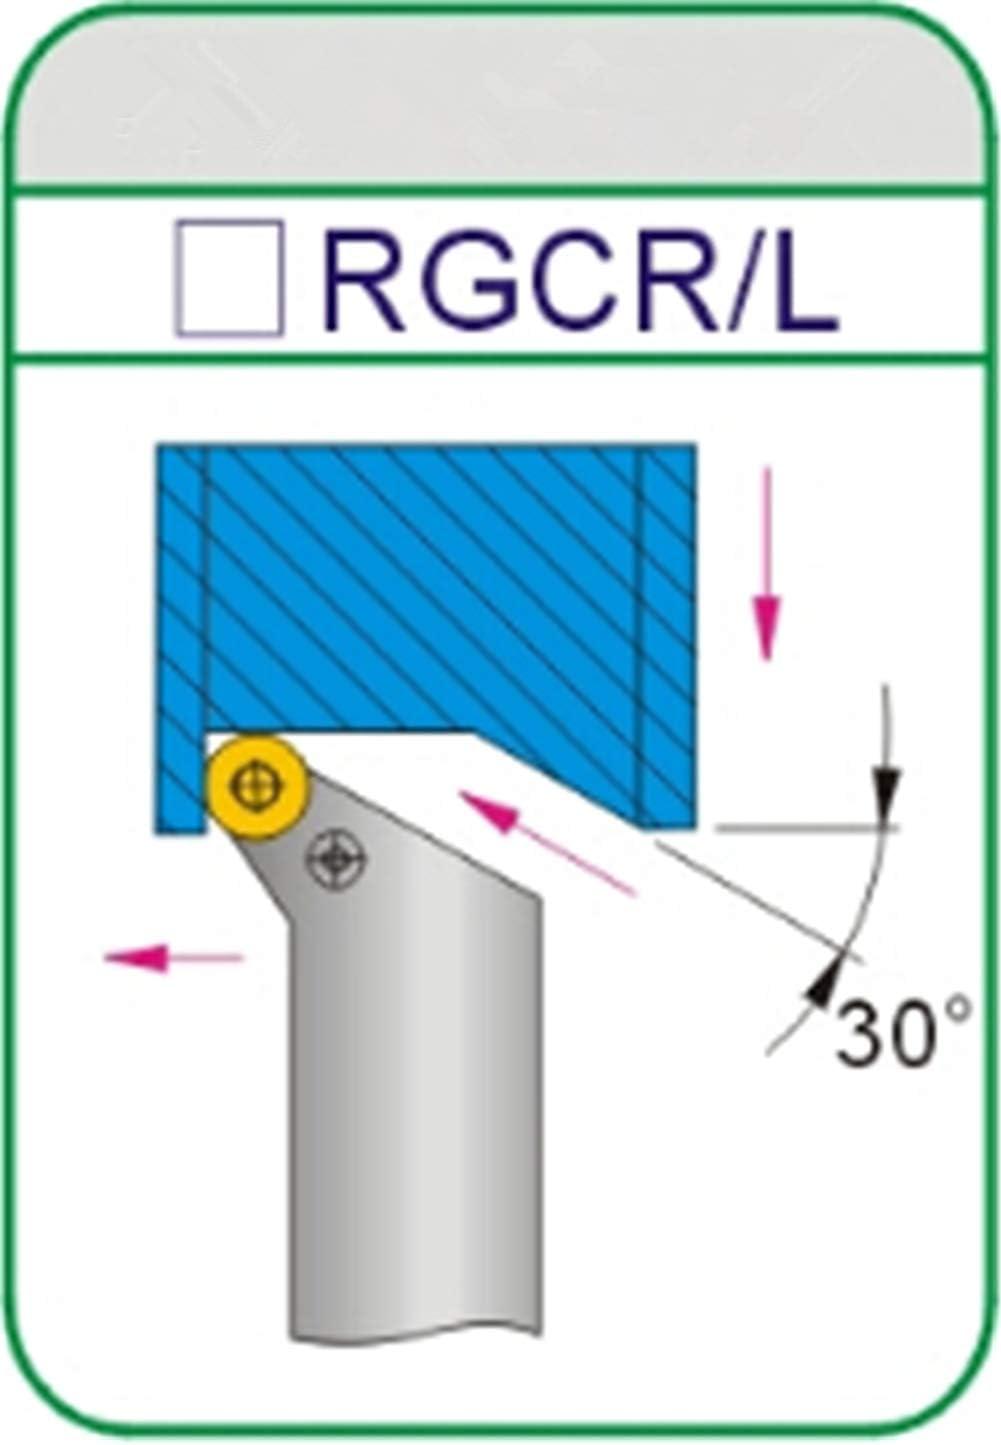 Gaobey SRGCL 2020K06 Index External Lathe Turning Holder For RCMT inserts